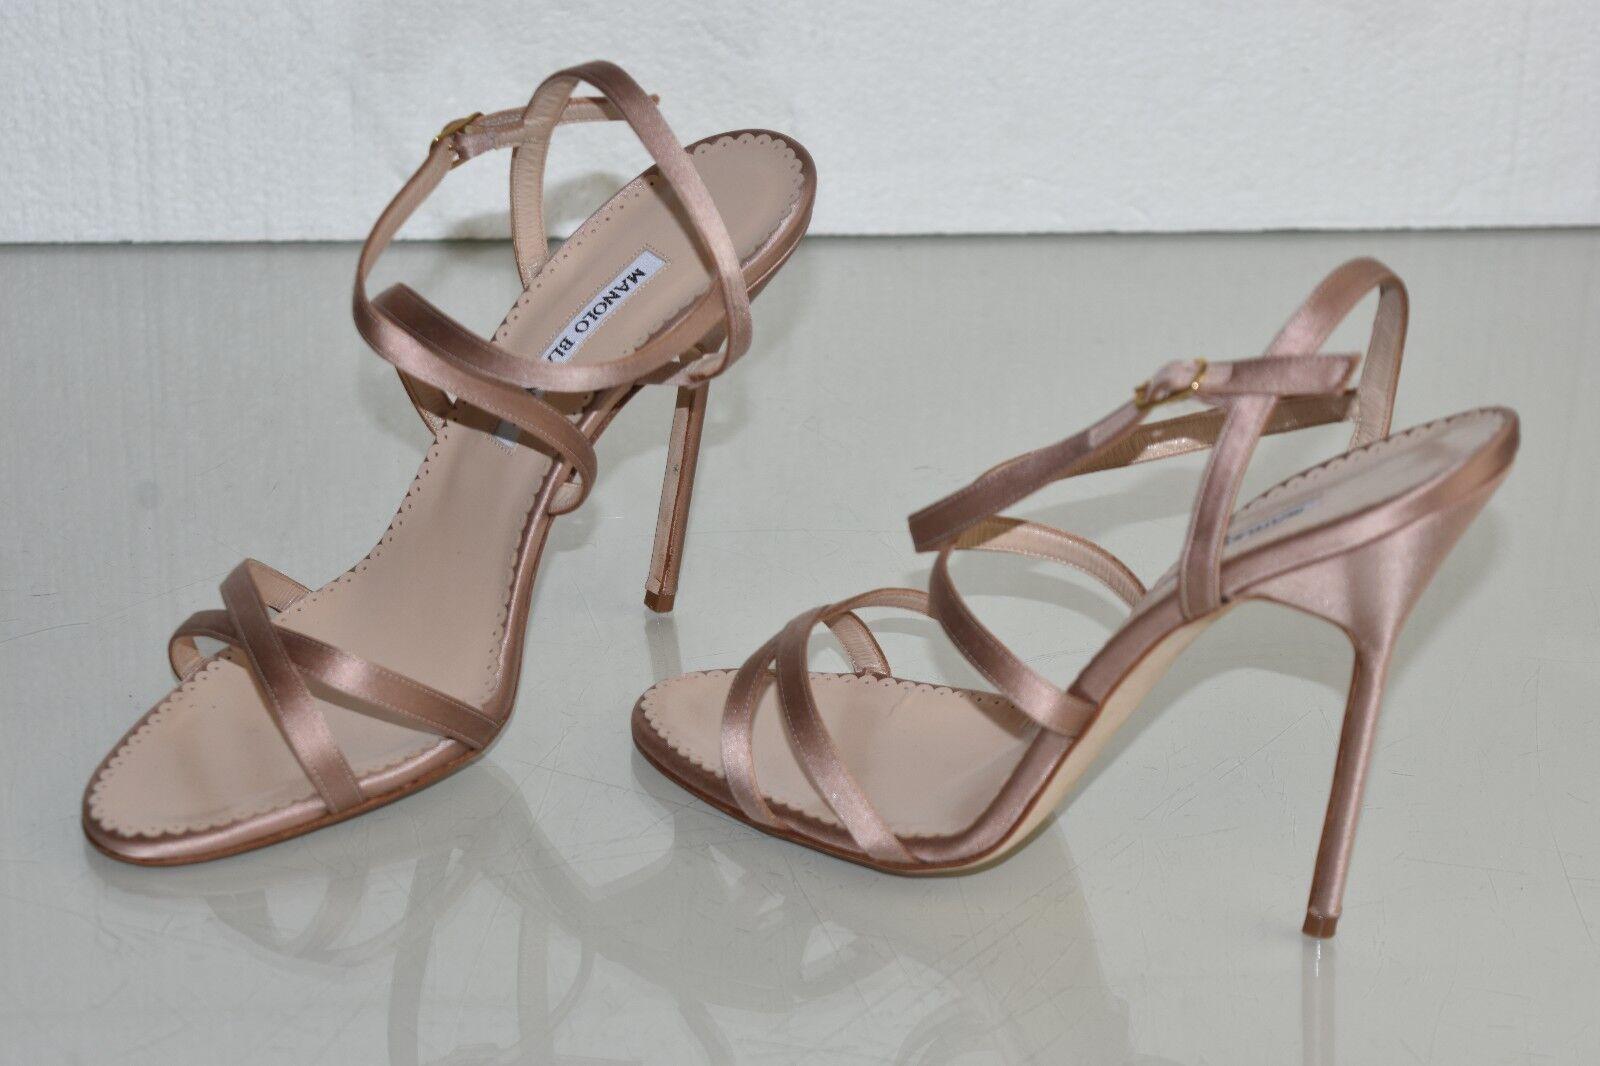 875 NEW Manolo Blahnik BAYAN Strappy NUDE Satin Sandal Beige 5  Heels shoes 41